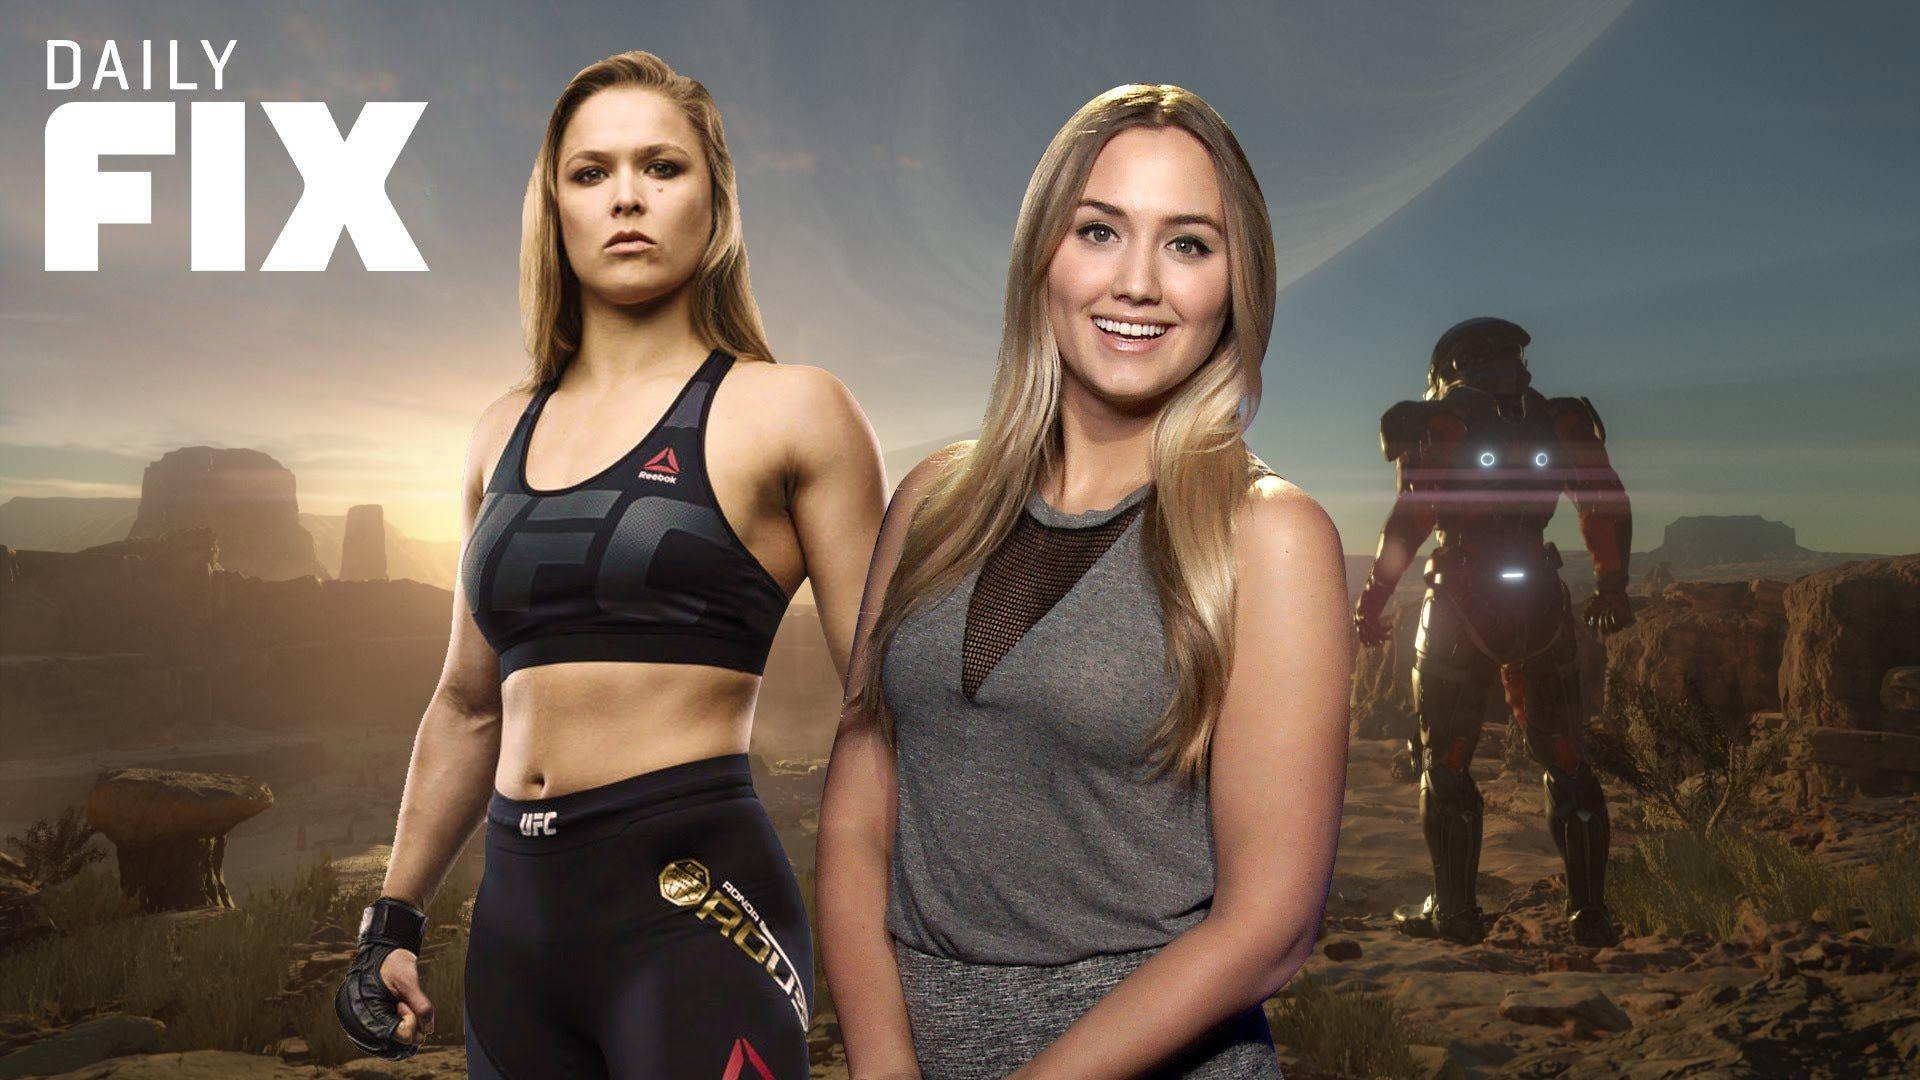 Ronda Rousey new wallpaper